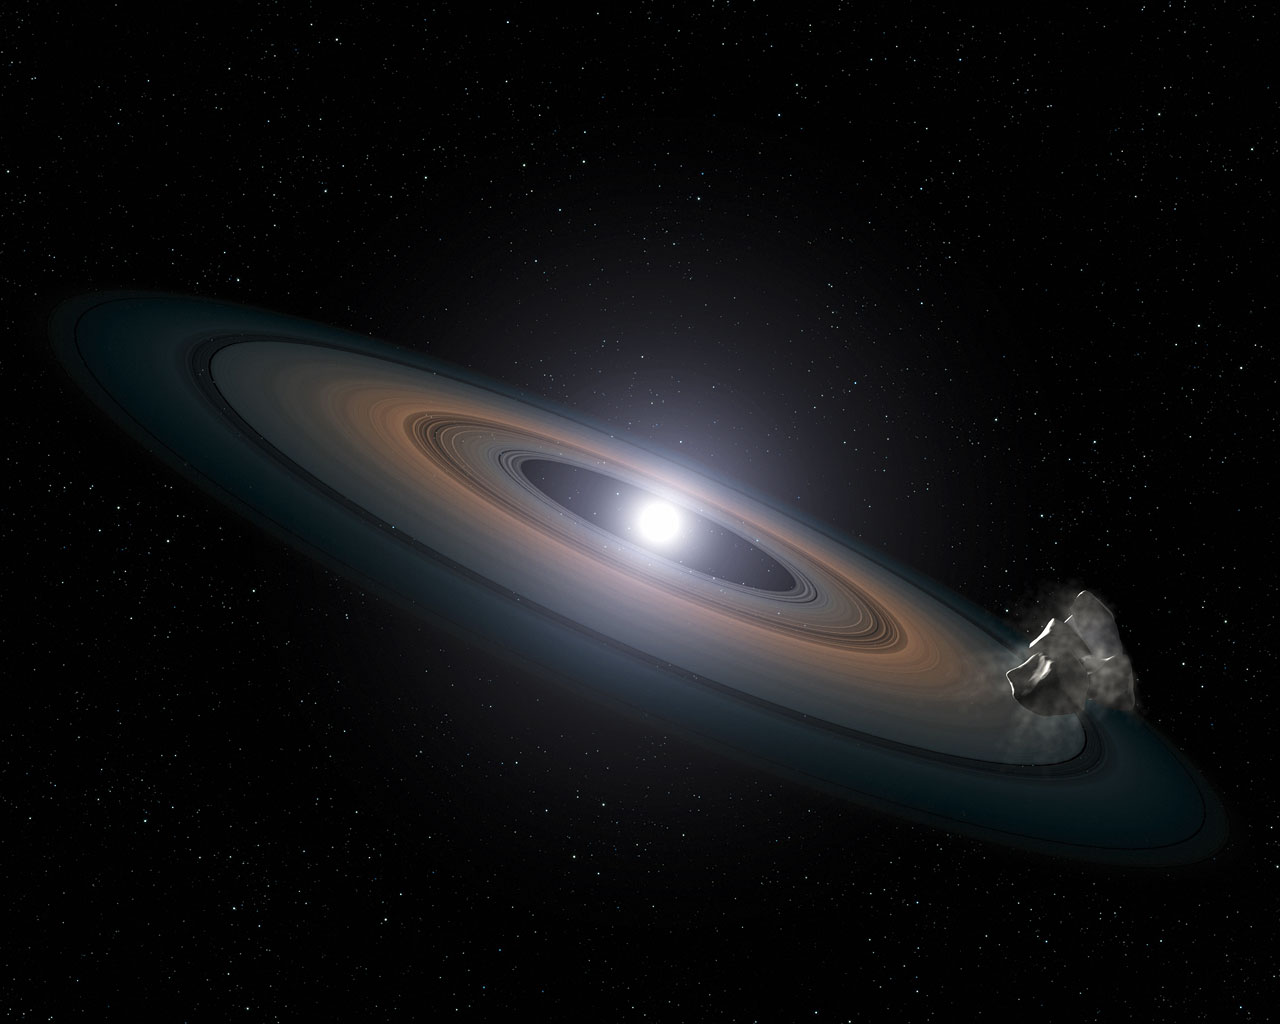 Disk trosek kolem bílého trpaslíka. Credit: NASA